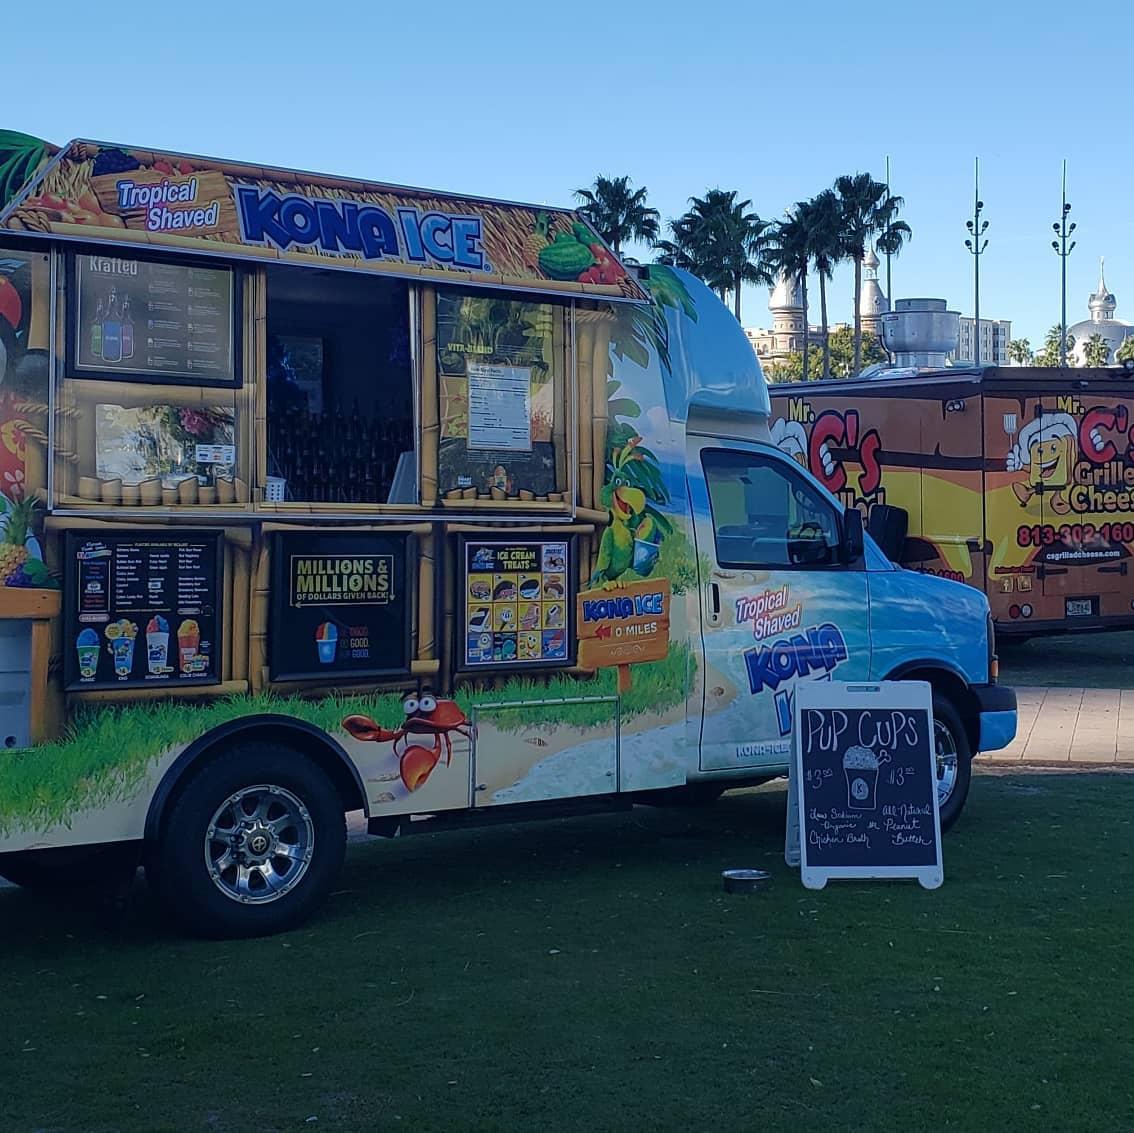 Kona Ice of Tampa Food Truck